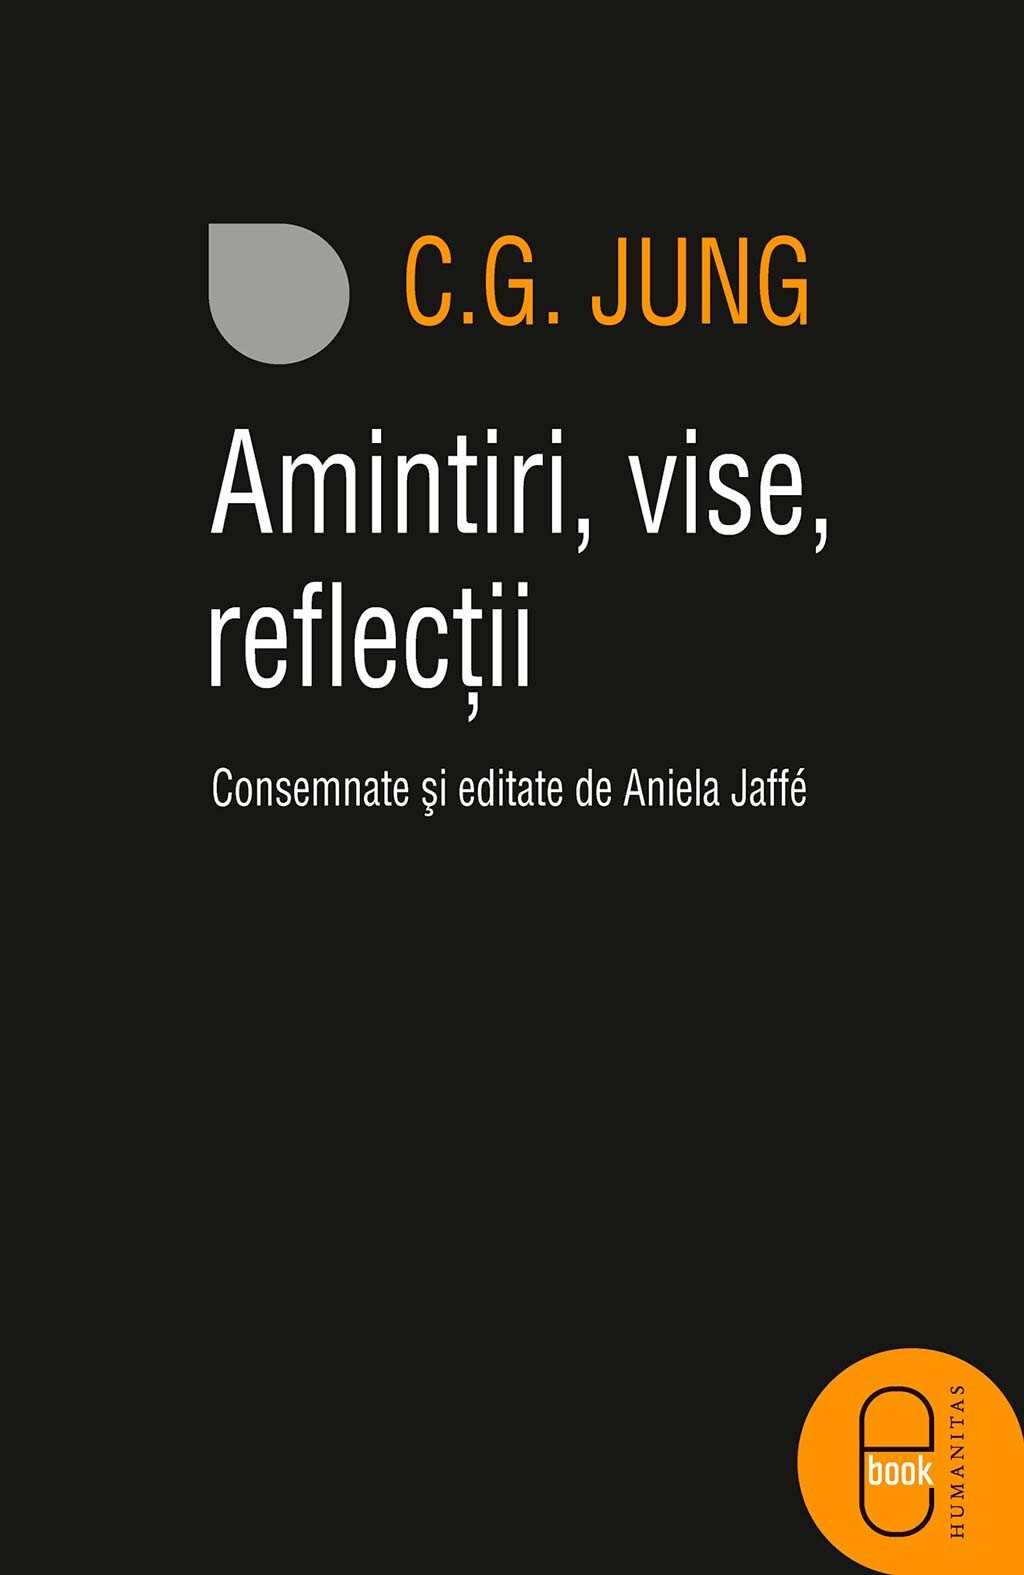 Amintiri, vise, reflectii PDF (Download eBook)